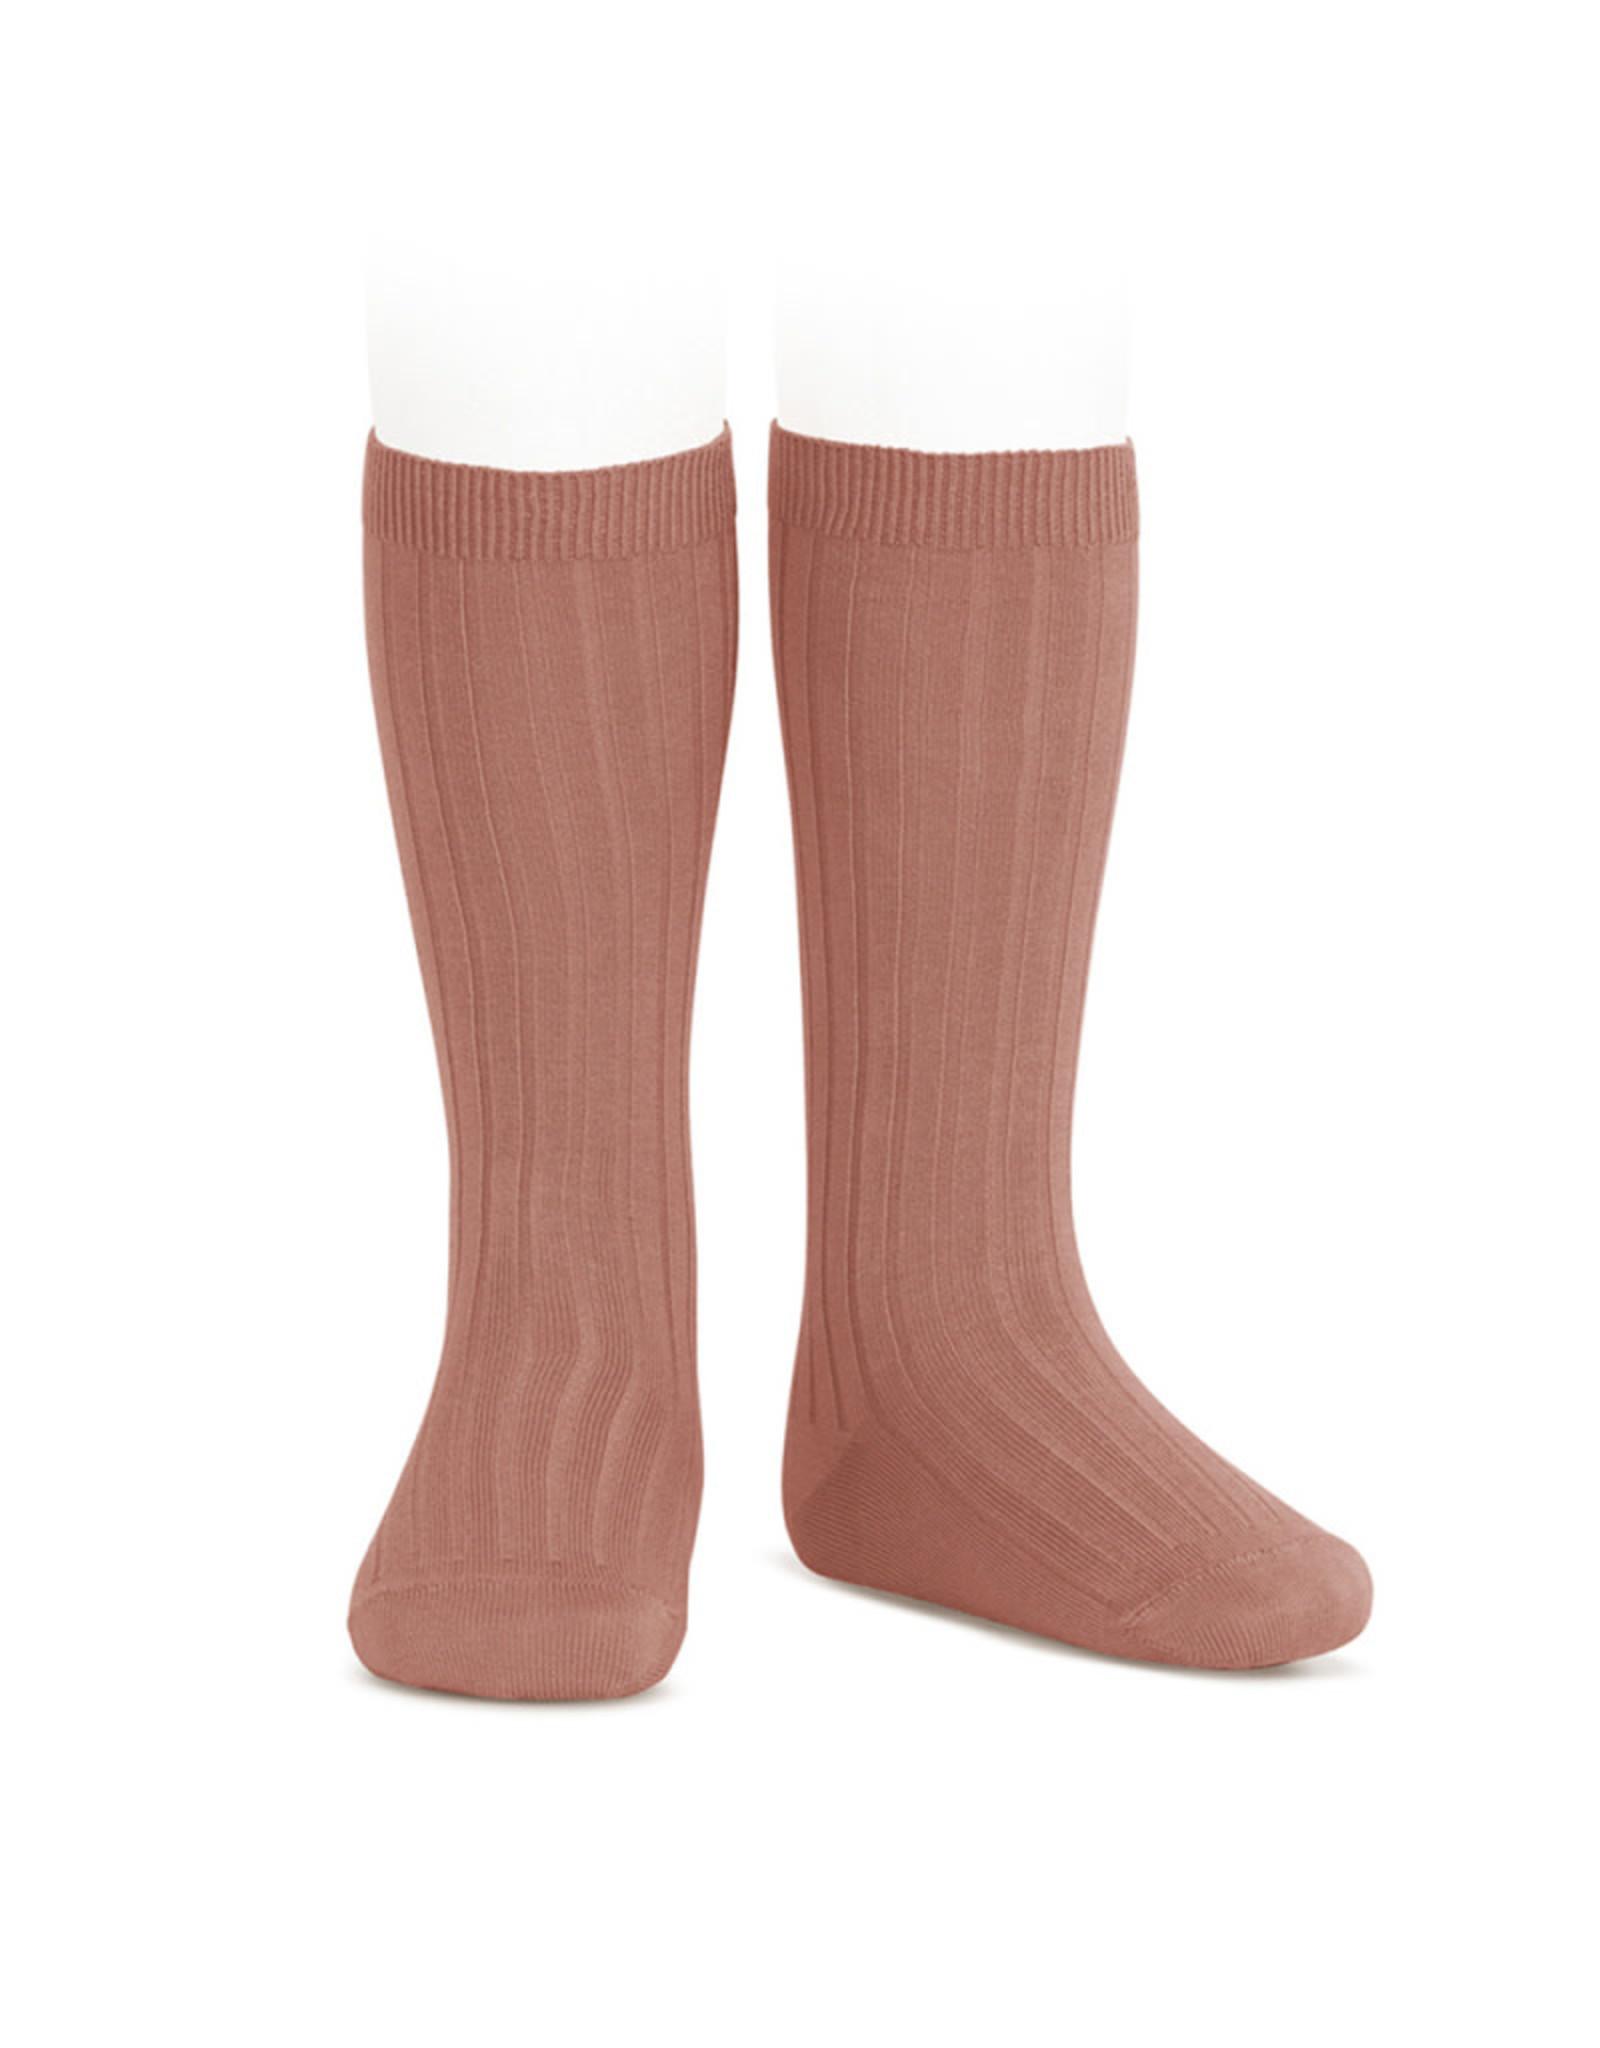 CONDOR Terracotta Rib Knee High Socks